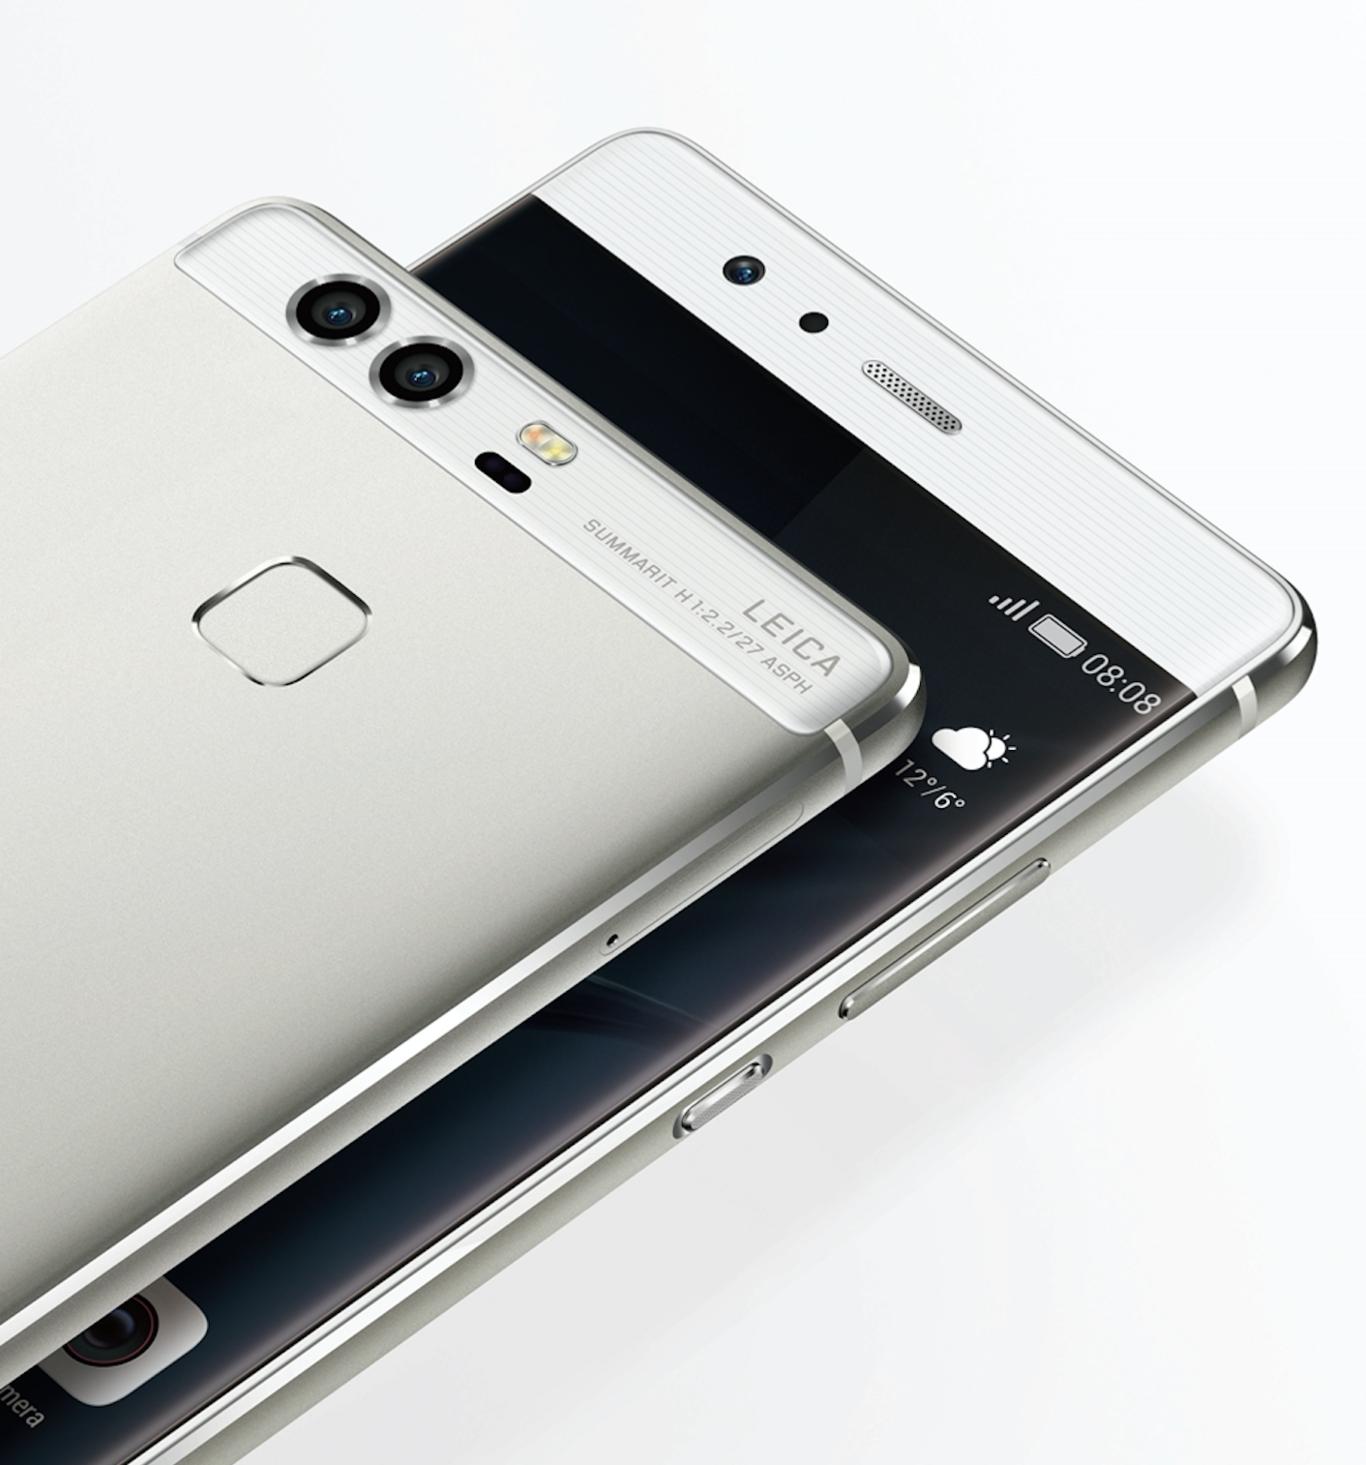 Leica y Huawei en el P9